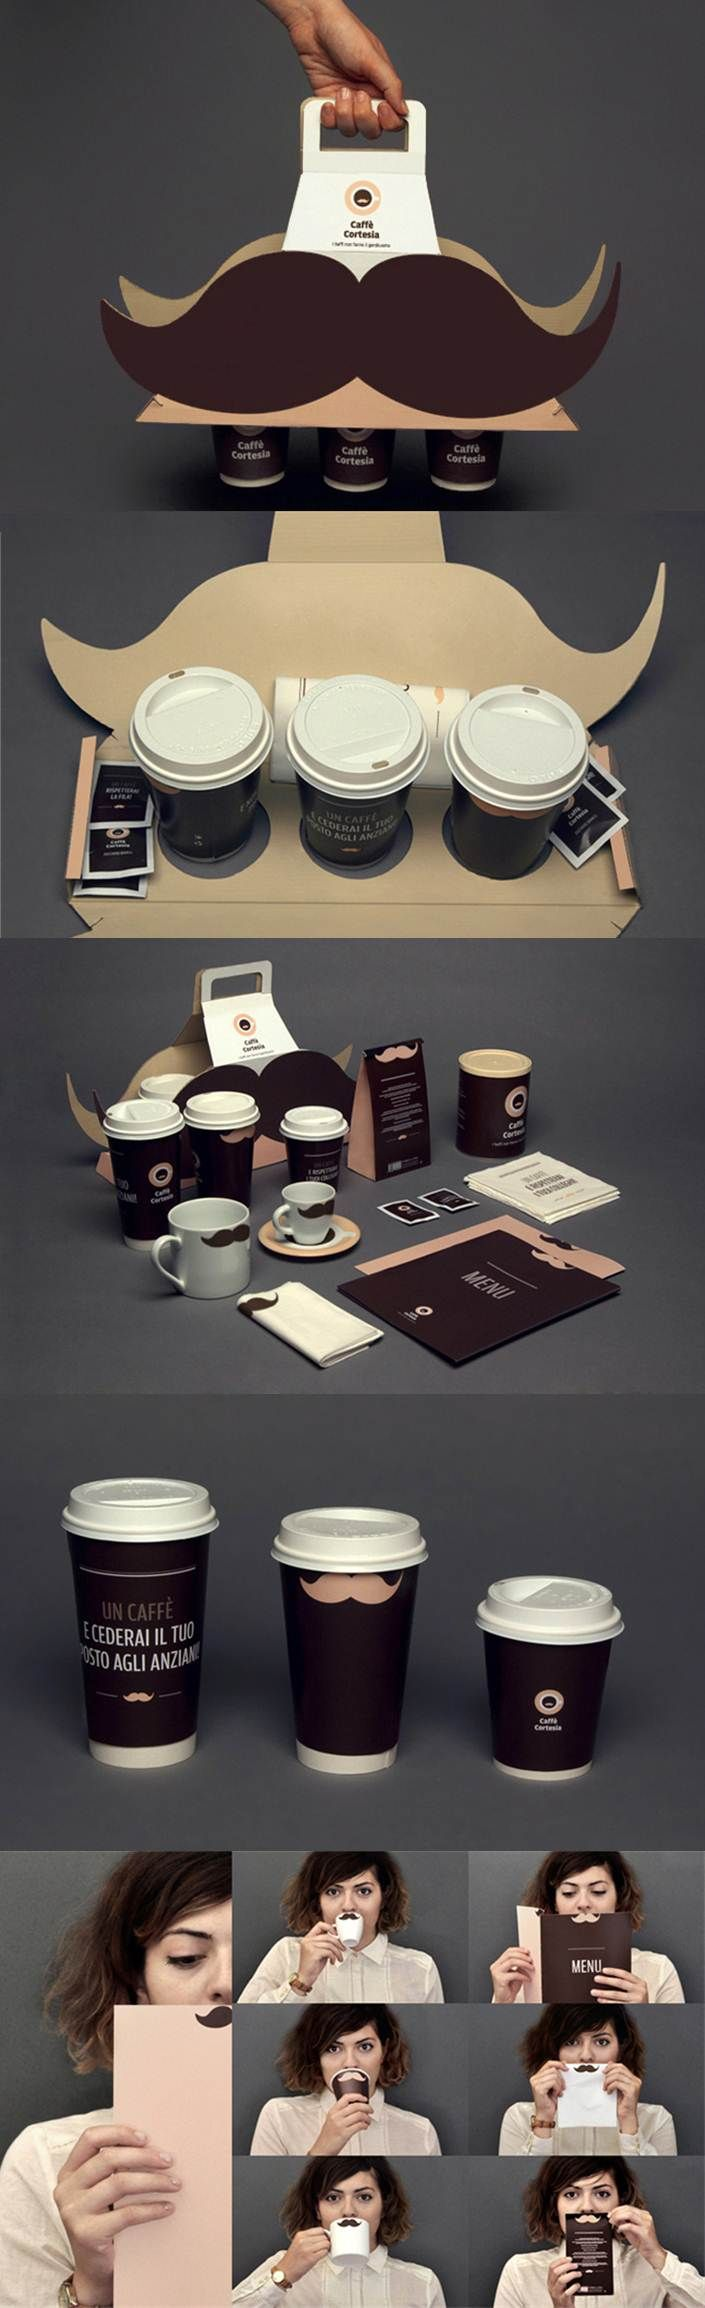 Designed by Augusto Arduini, a graduate of Politecnico di Milano, Italy. http://www.packagingoftheworld.com/2011/10/caffe-cortesia.html